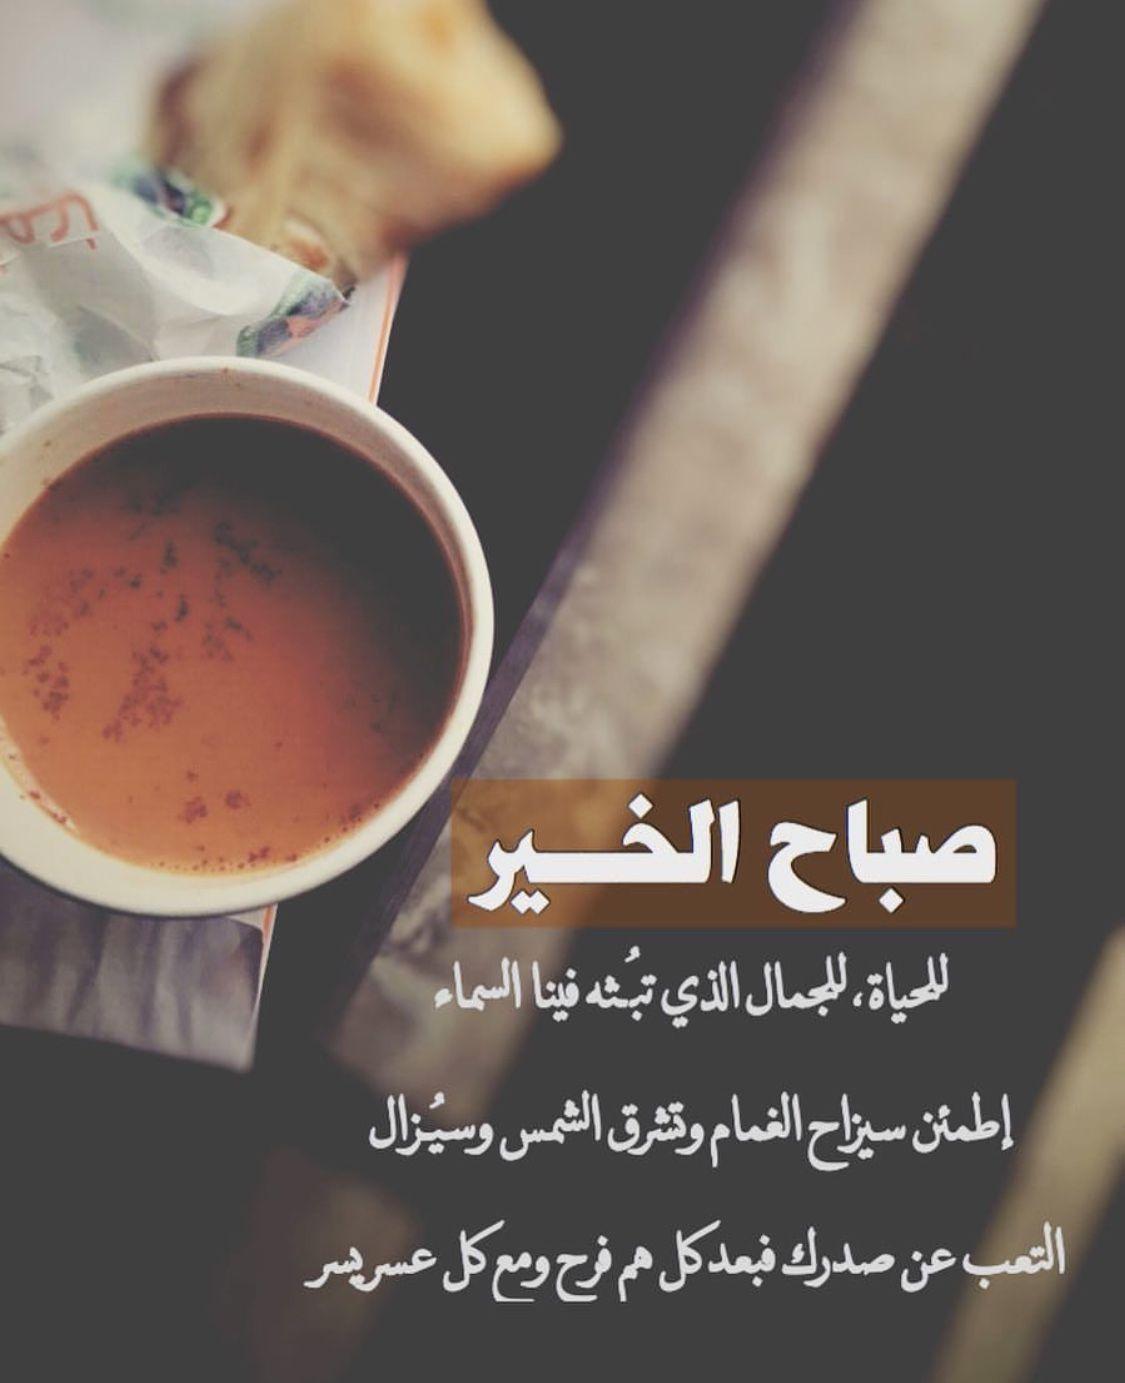 Goodmorning صباح الخير Photo Quotes Romantic Love Quotes Good Morning